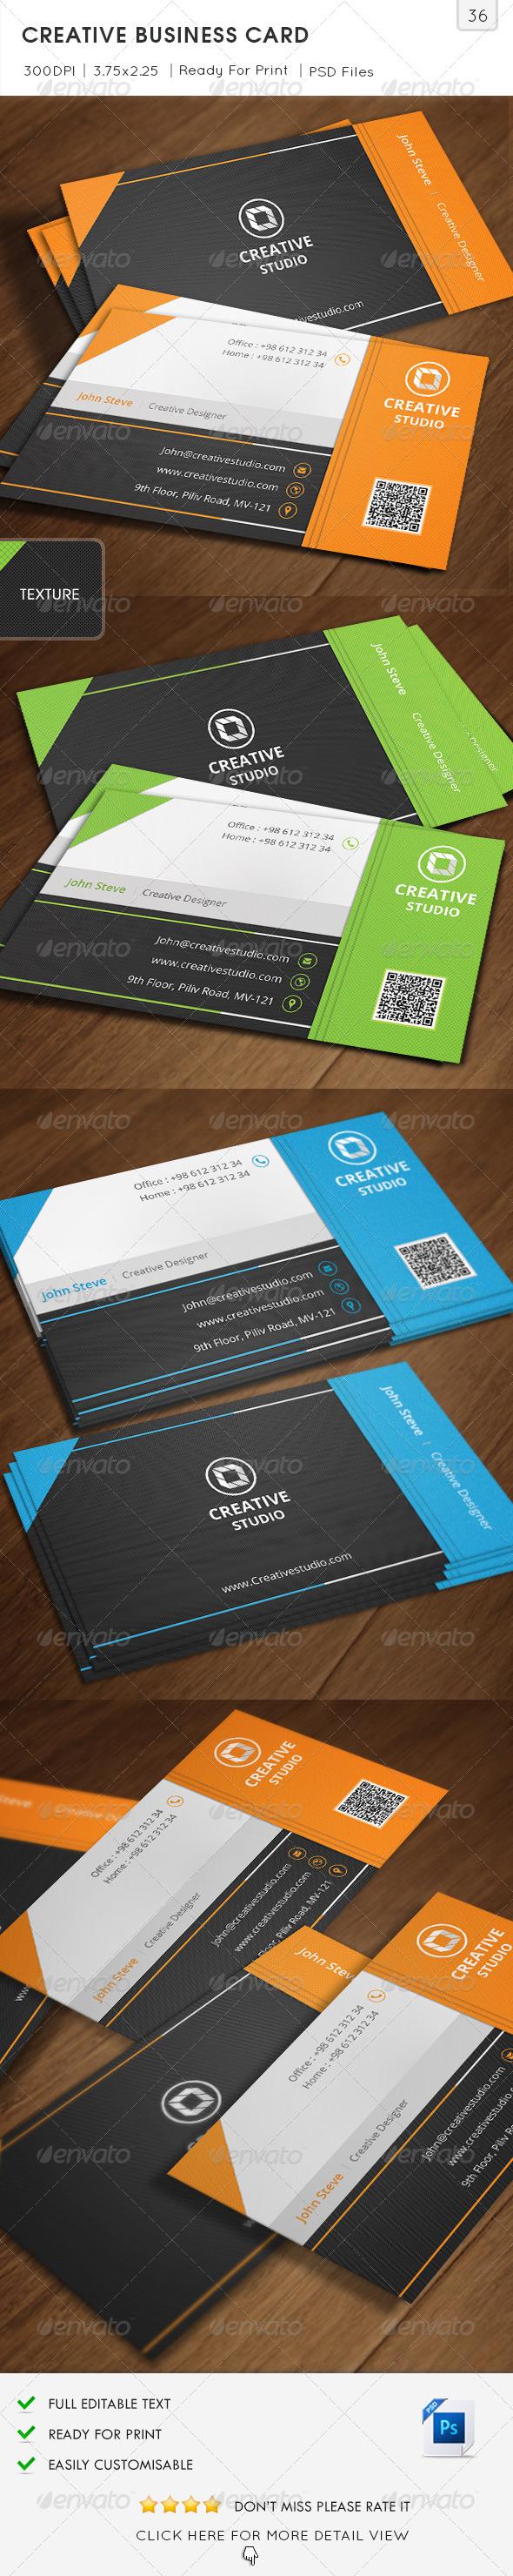 Creative Business Card v36  - Creative Business Cards